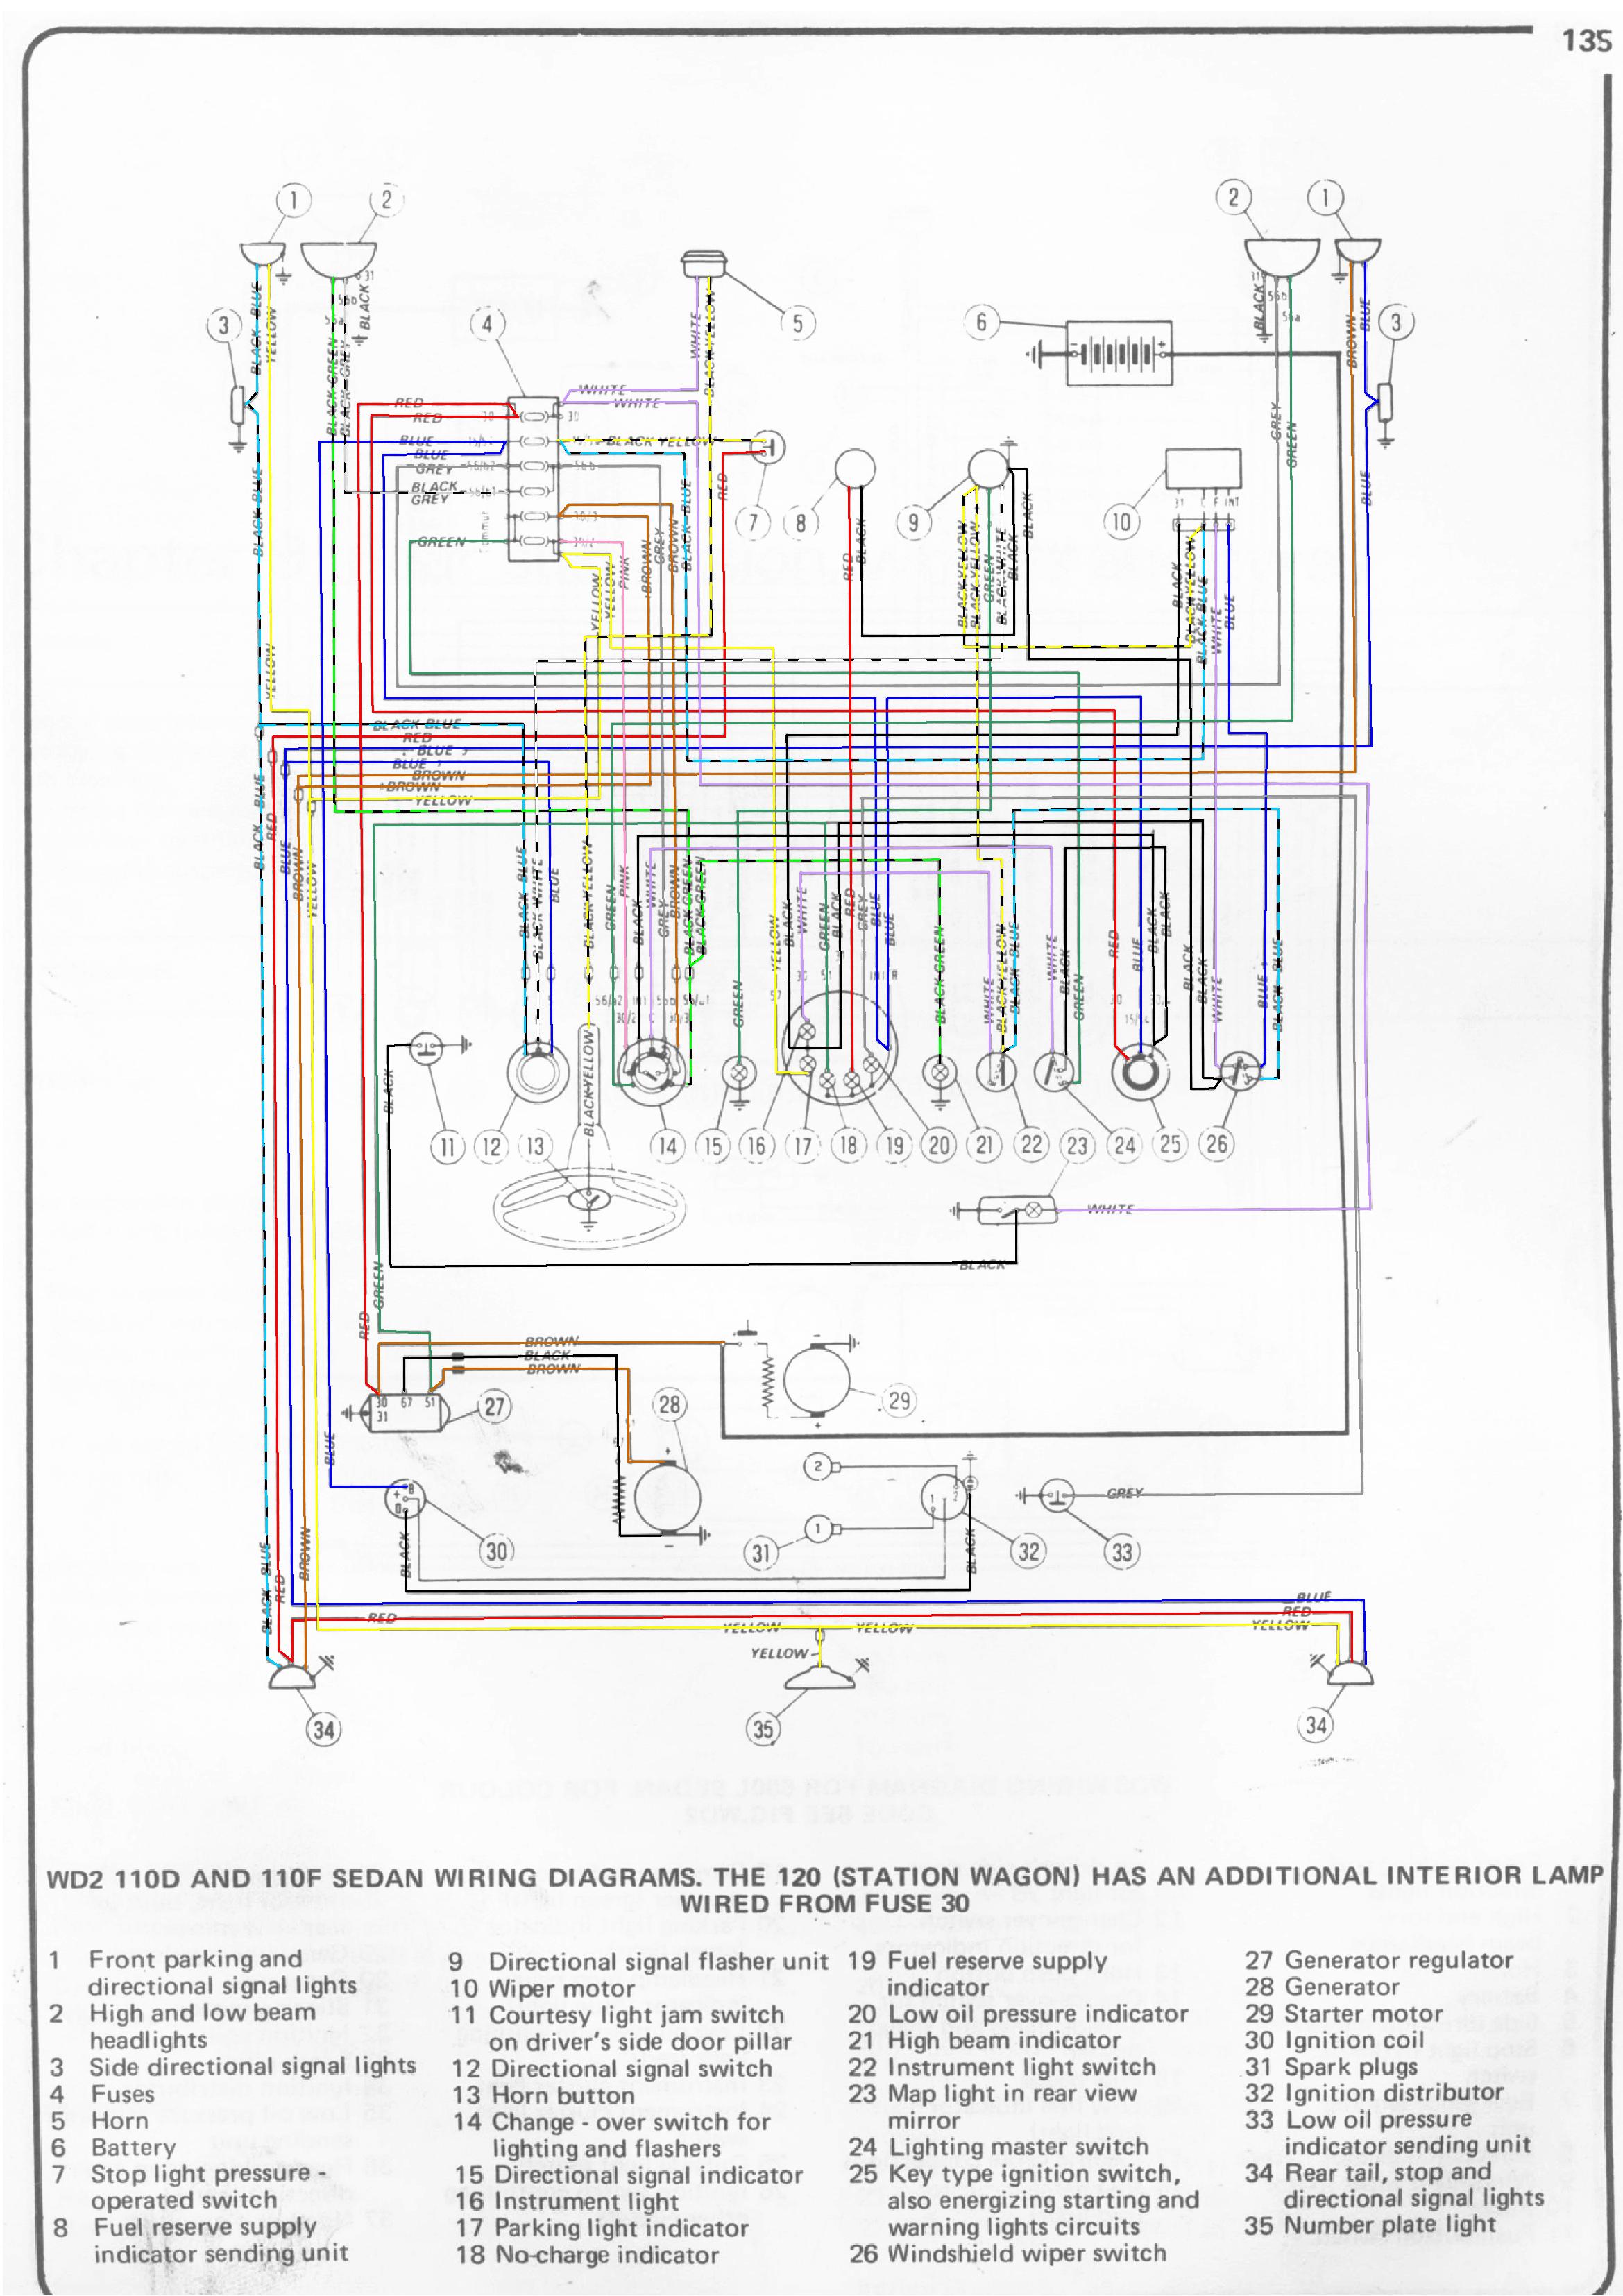 Fiat 500l Wiring Harness Fiat 500 Ferrari Edition Wiring Diagram ~ ODICIS